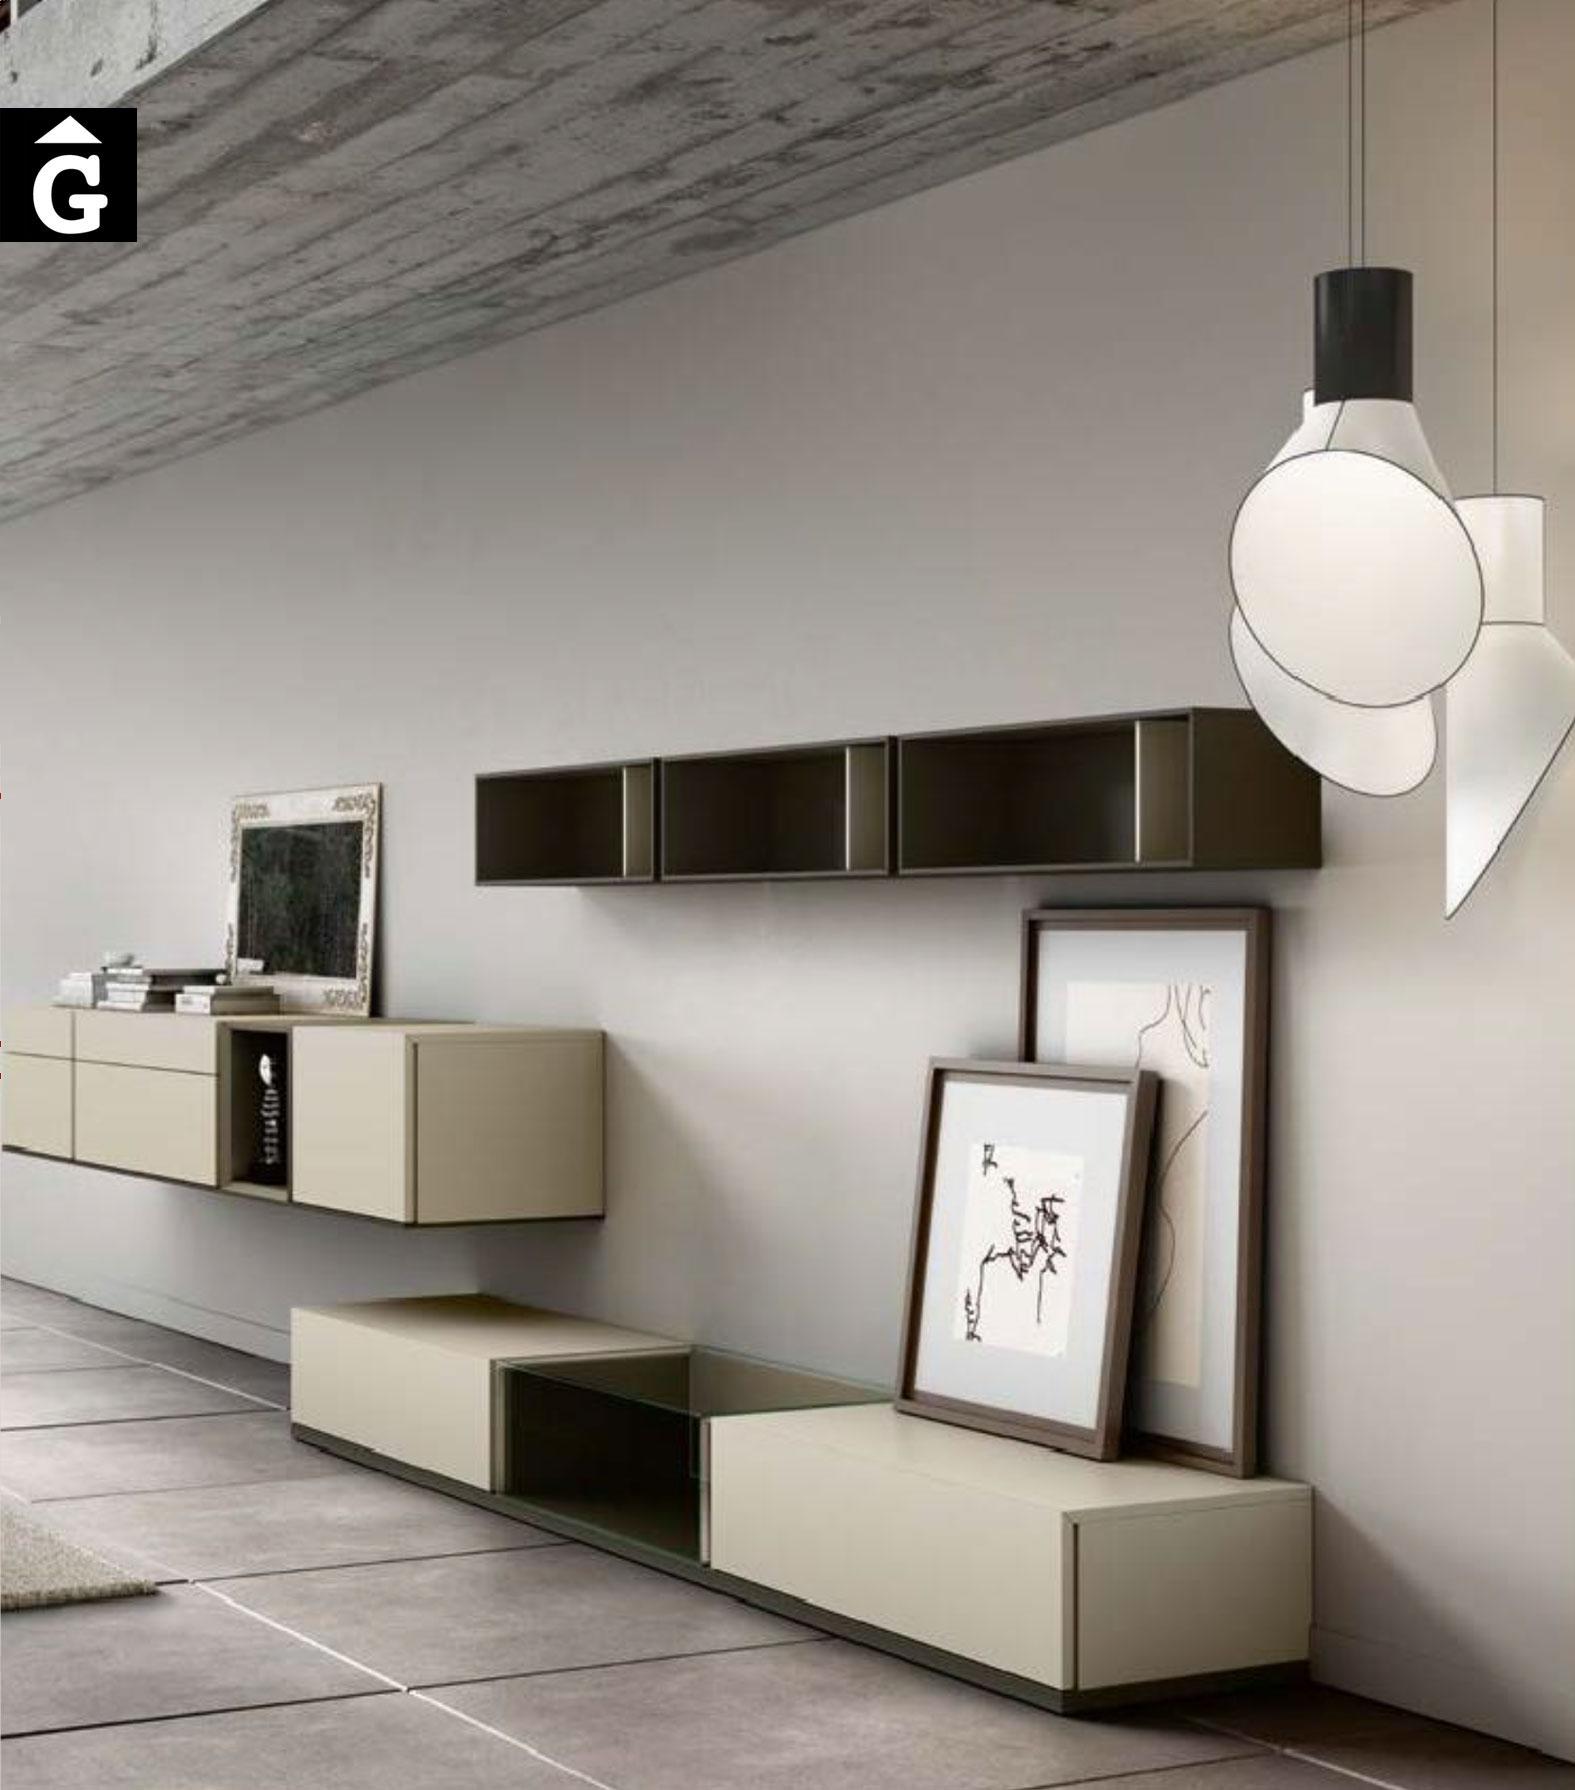 mobles-19-V-CONNECTOR-EMEDE-mobles-by-Mobles-GIFREU-Girona-ESPAI-EMEDE-Epacio-emede-Muebles-MD-moble-menjador-Sala-estar-habitatge-qualitat-laca-xapa-natural